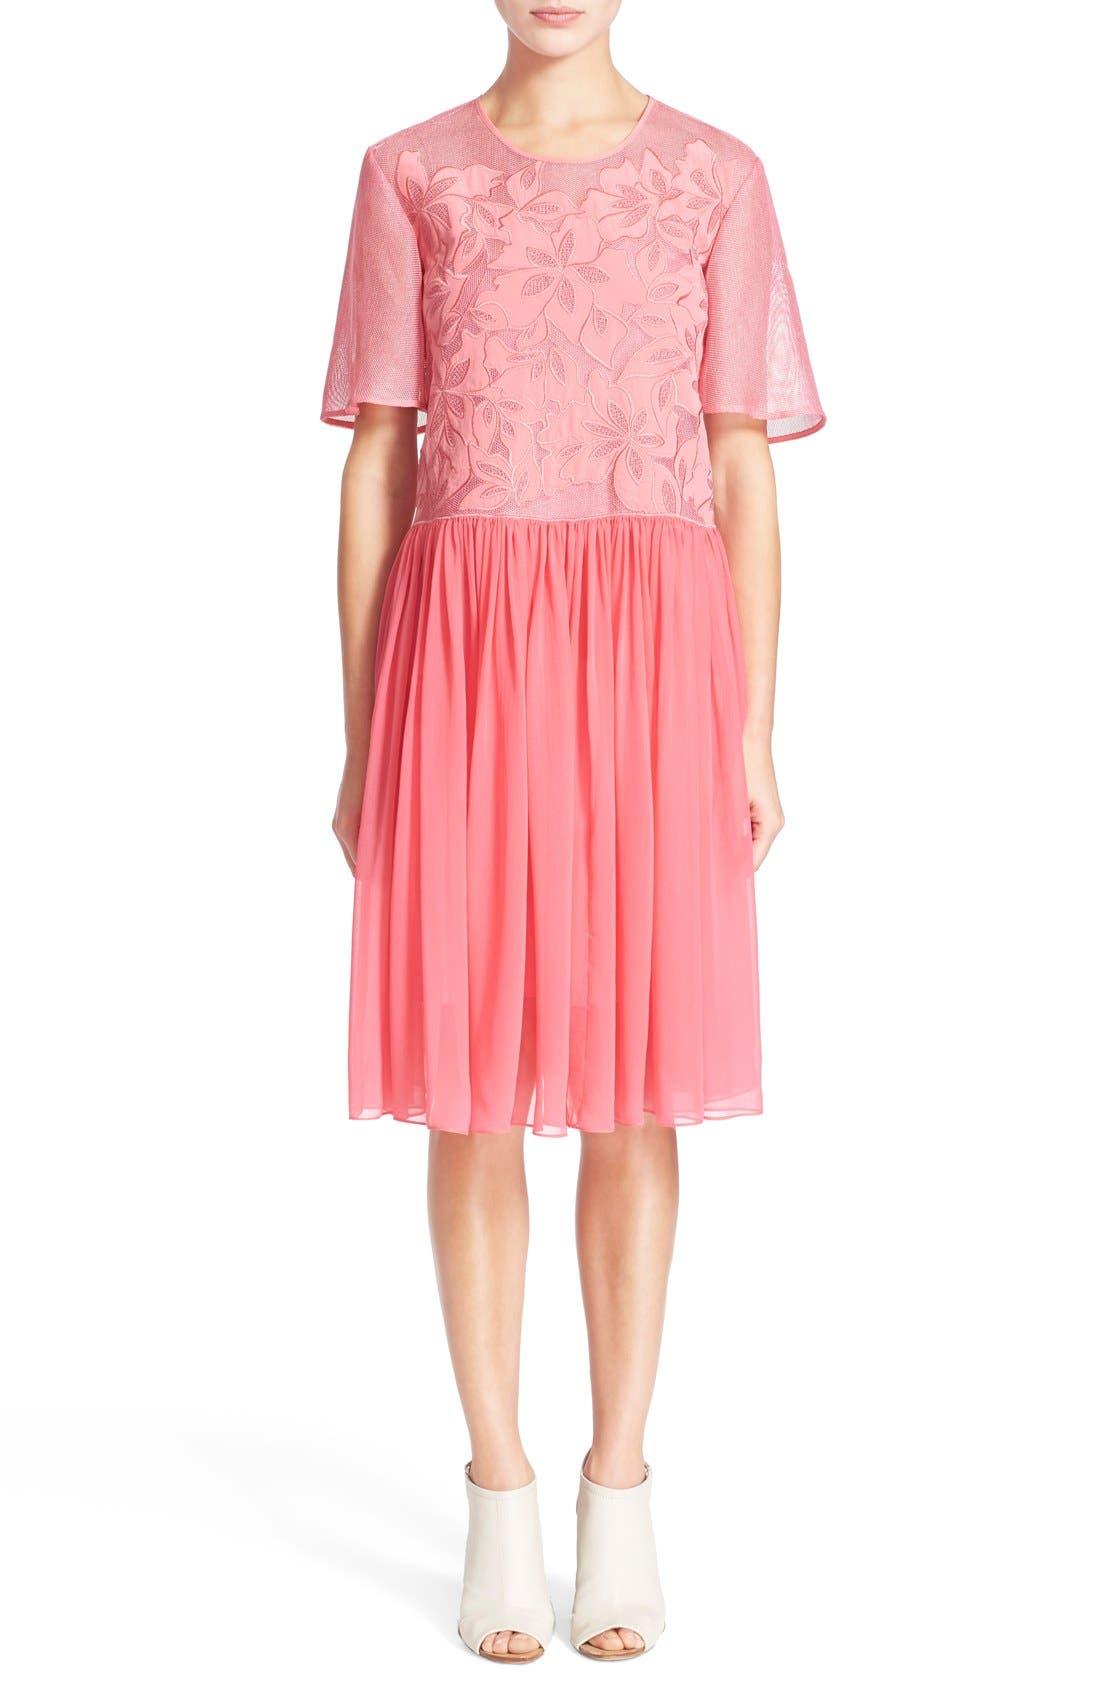 Alternate Image 1 Selected - Rebecca Taylor Floral Appliqué Dress